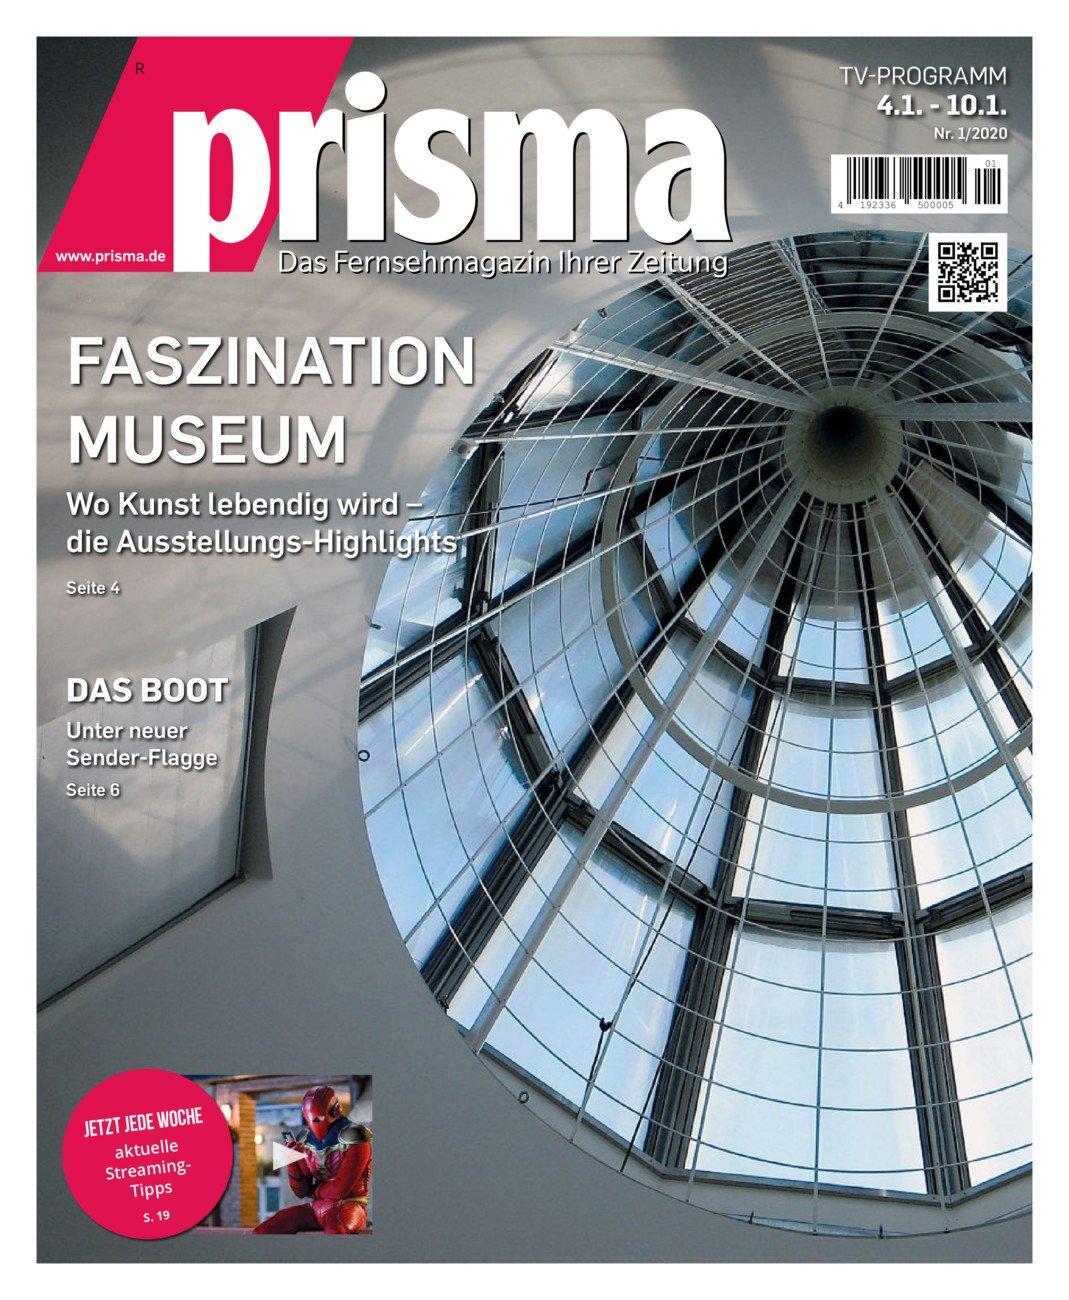 Prisma 4.1.-10.1.